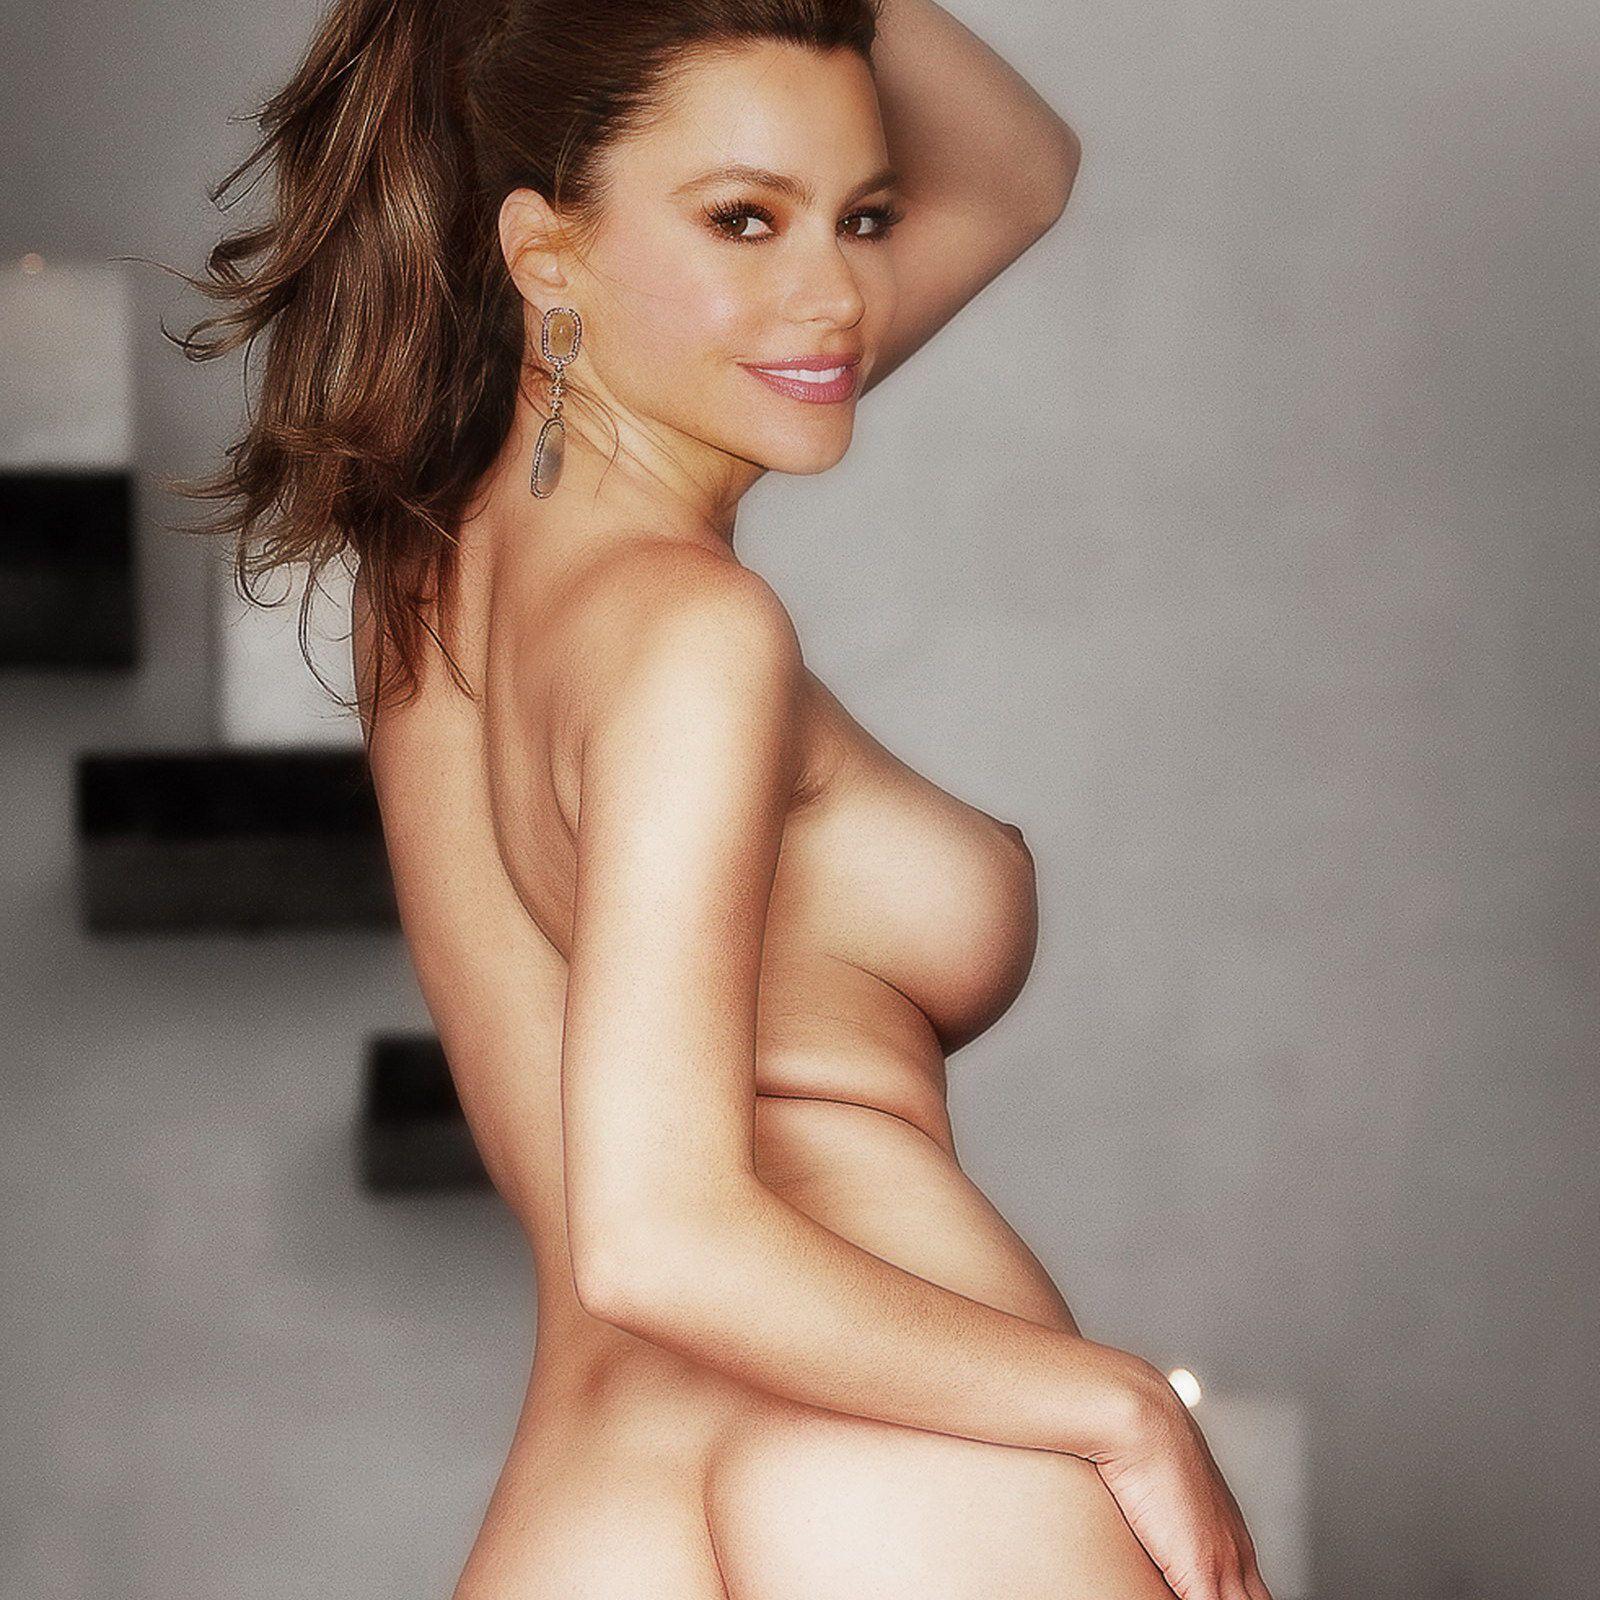 sofia topless Naked vergara